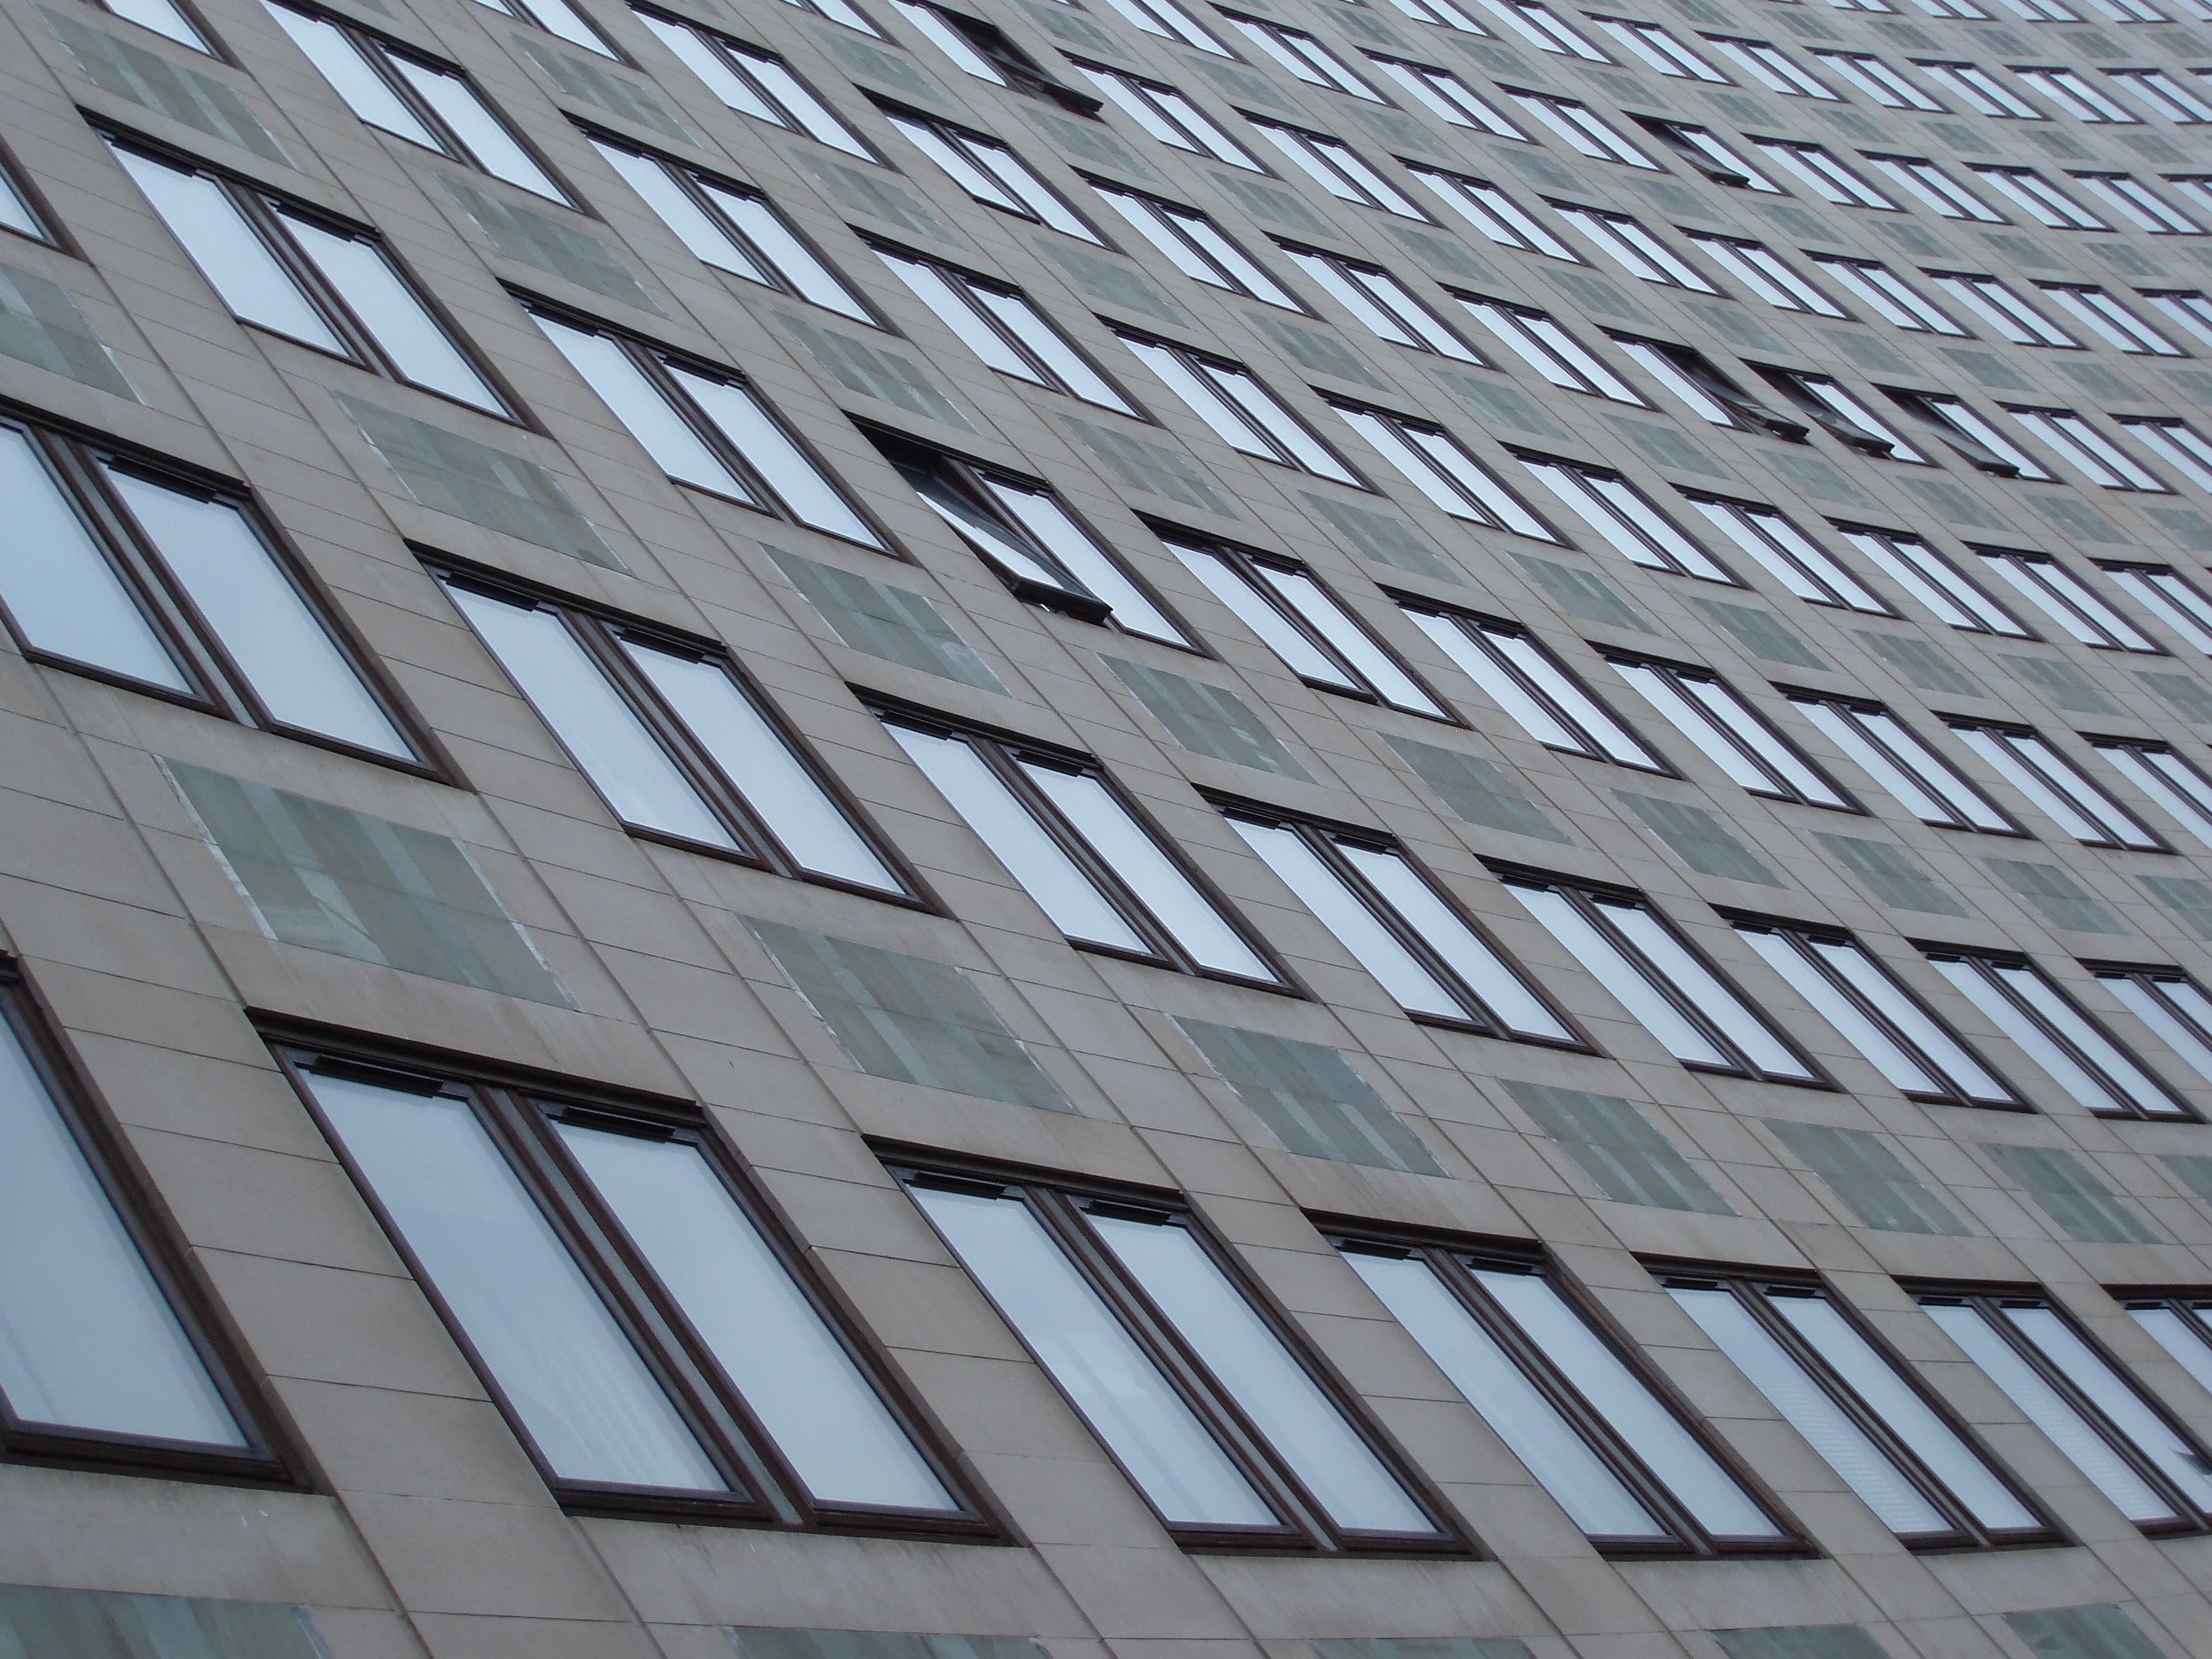 Office windows photo